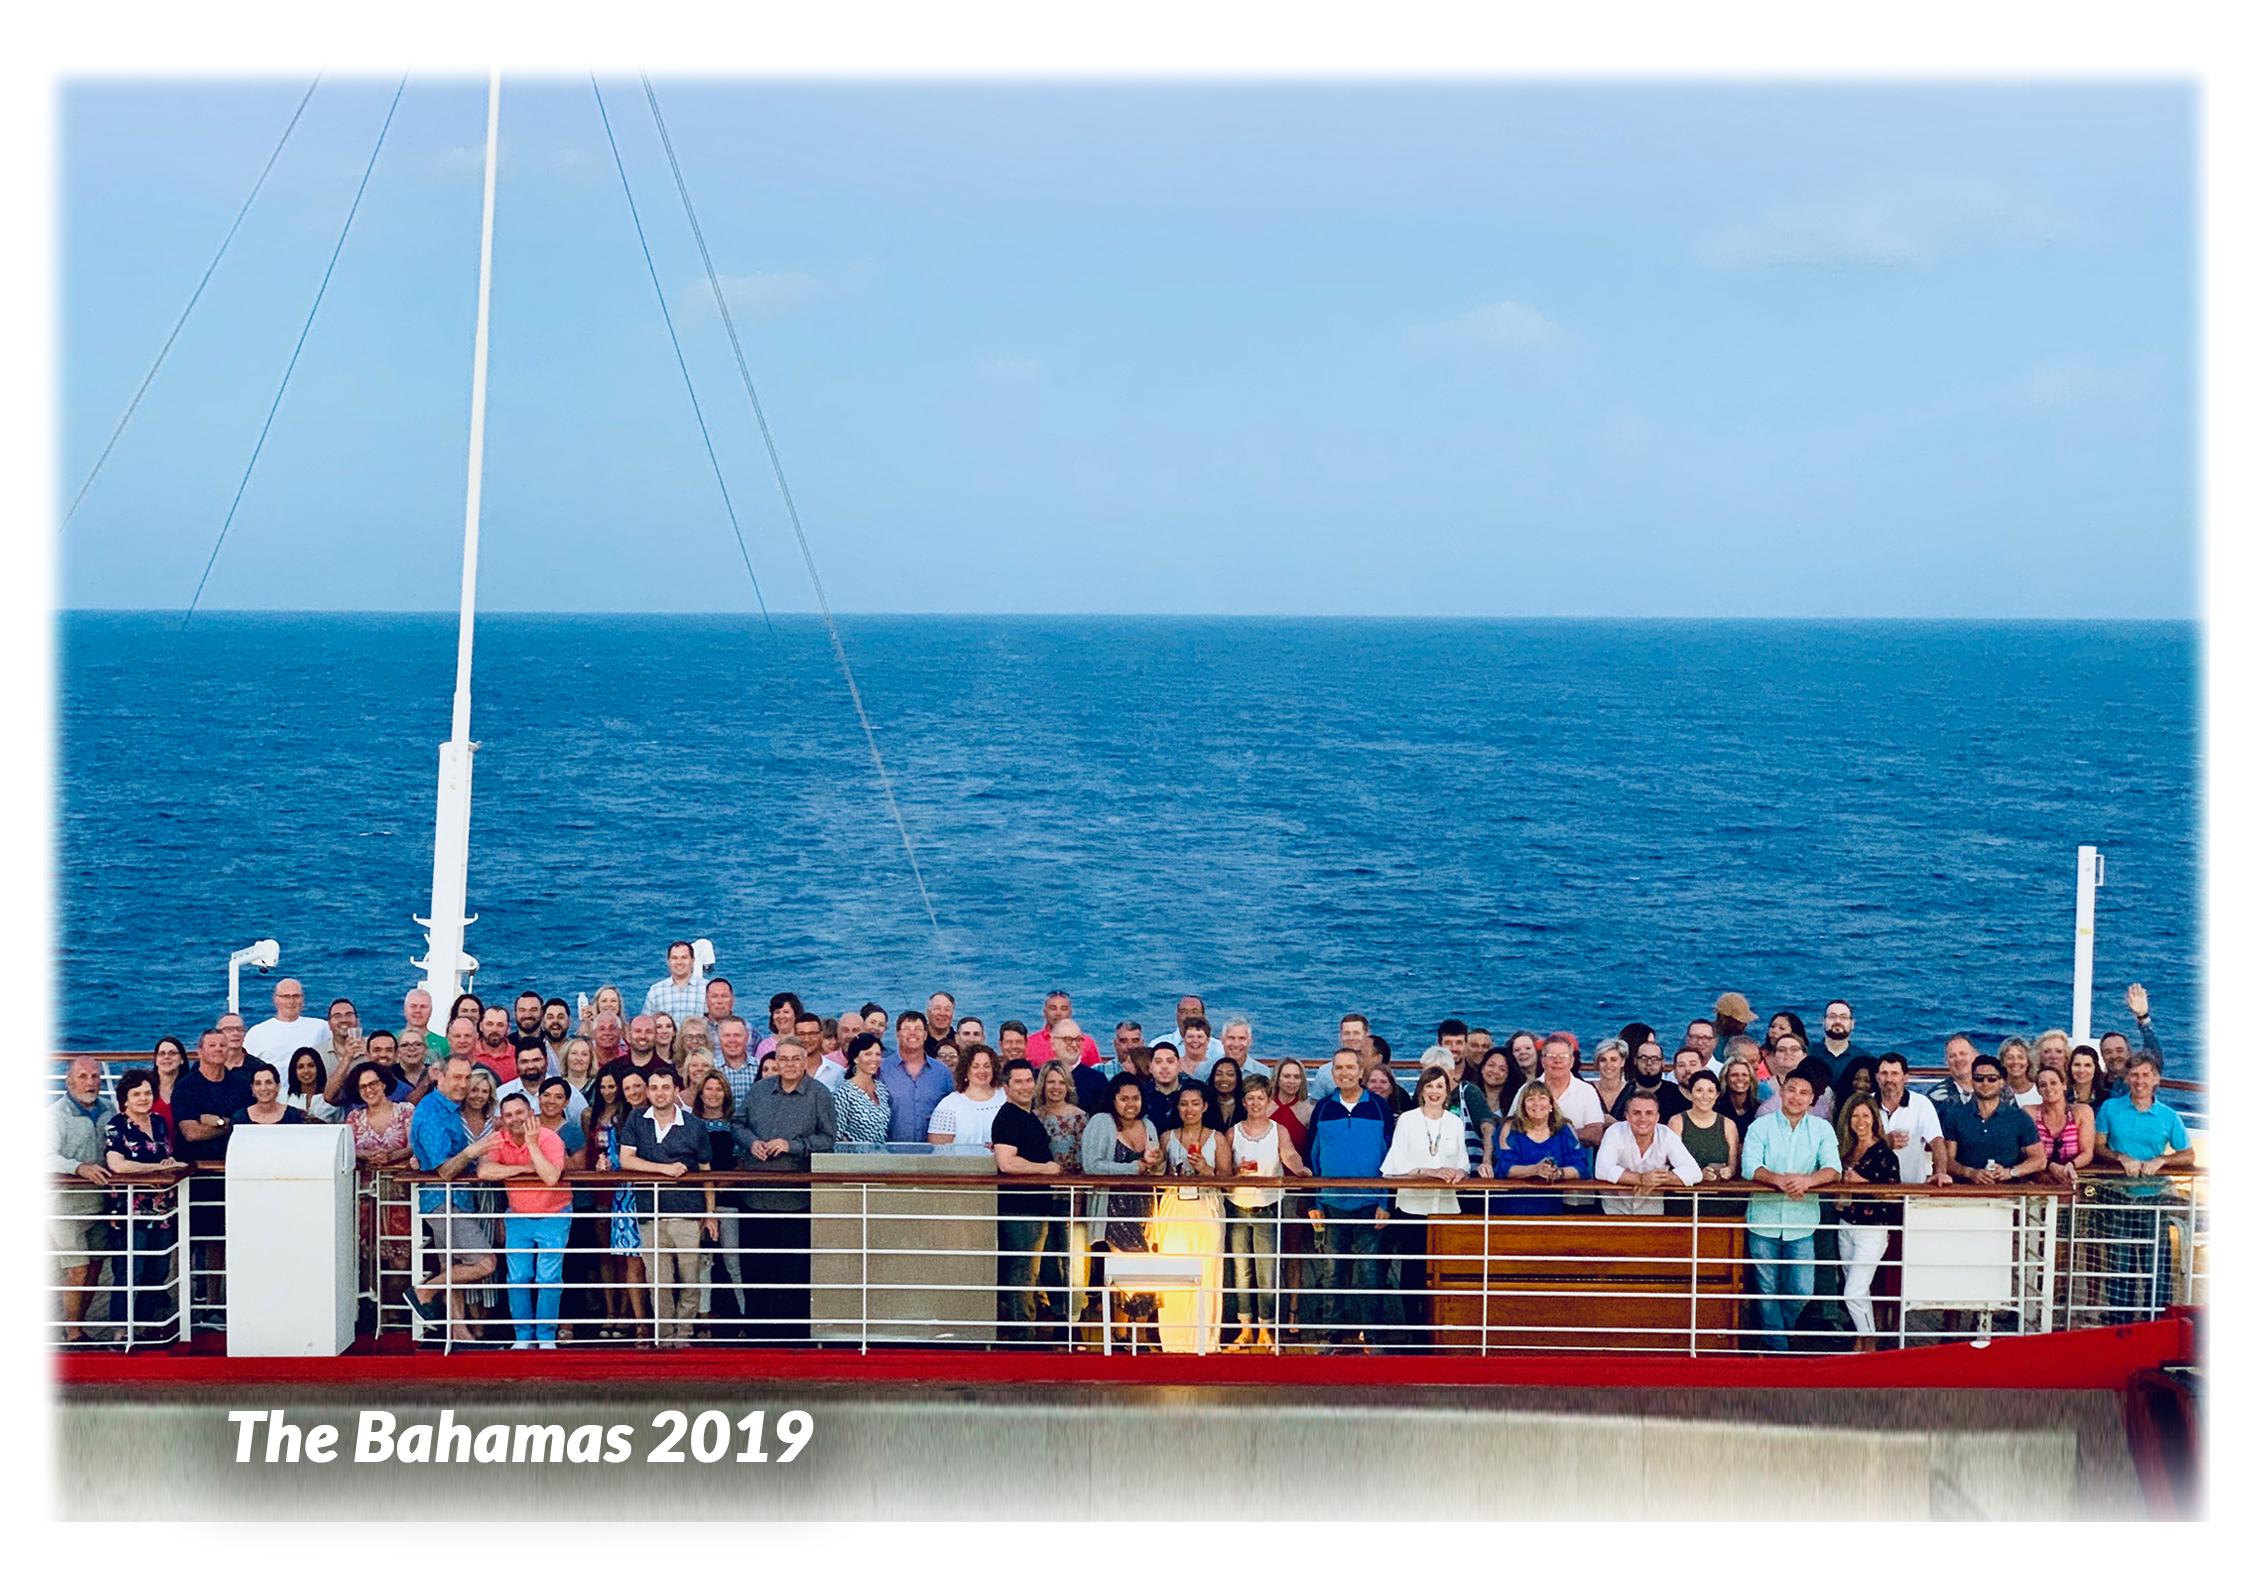 e4 Team - The Bahamas 2019 Website Group Photo